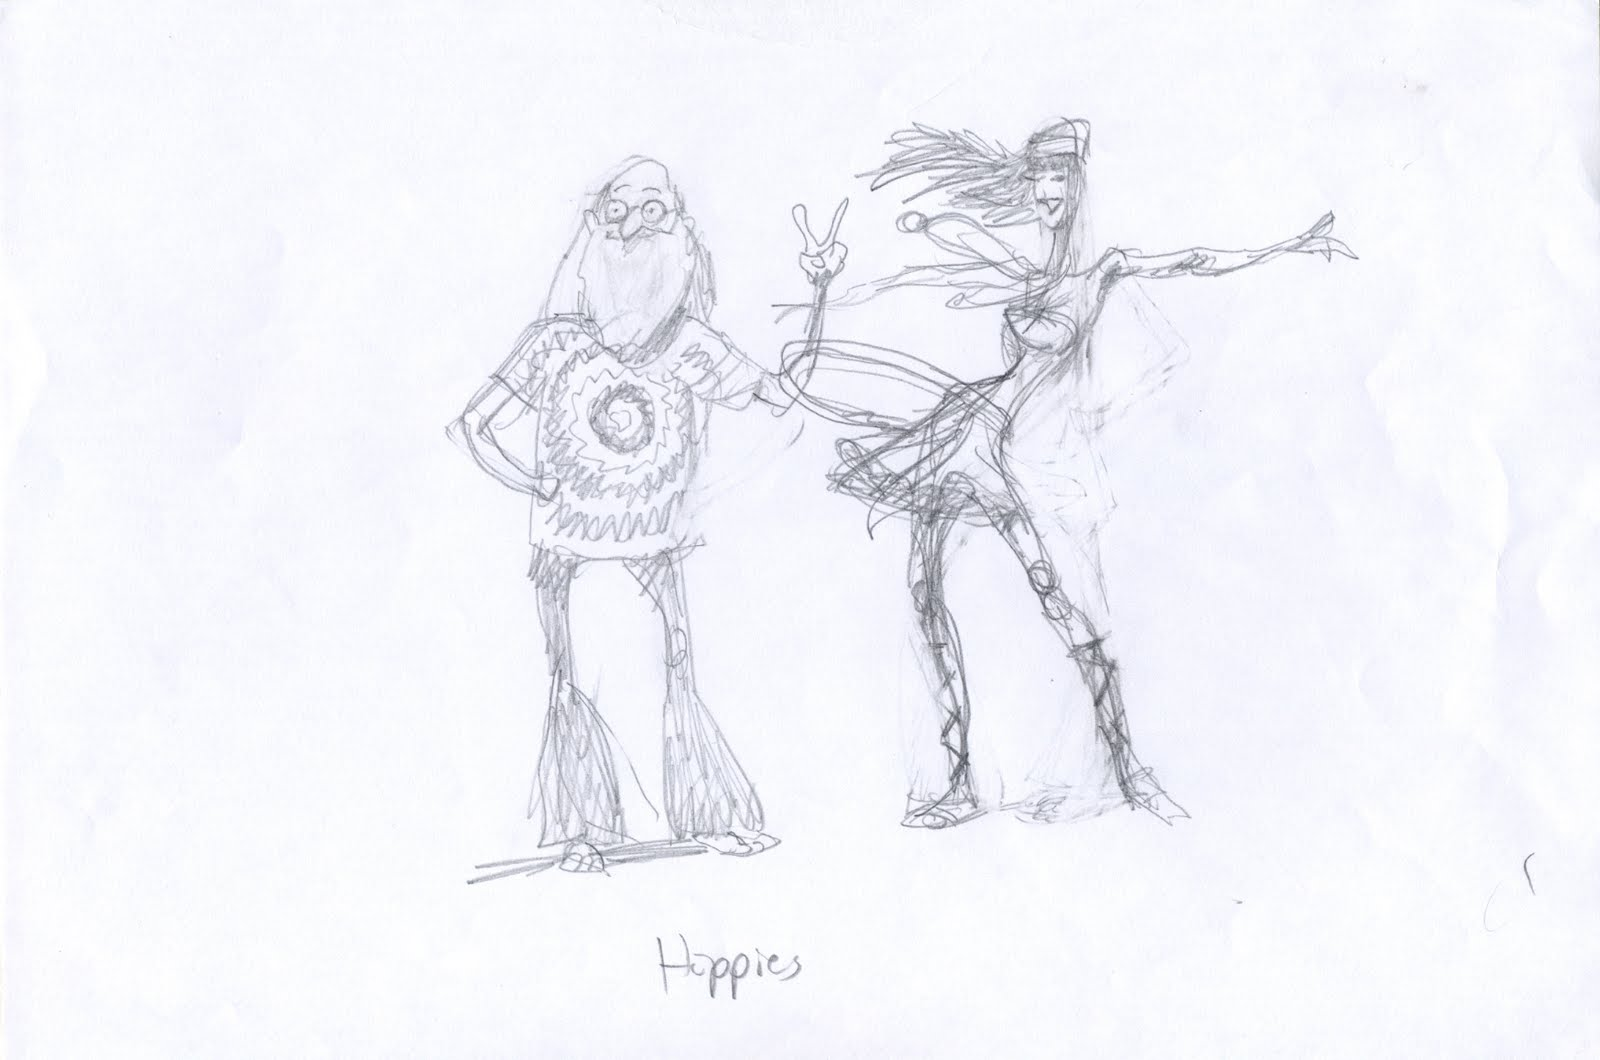 Scribble Junkies: Hippies